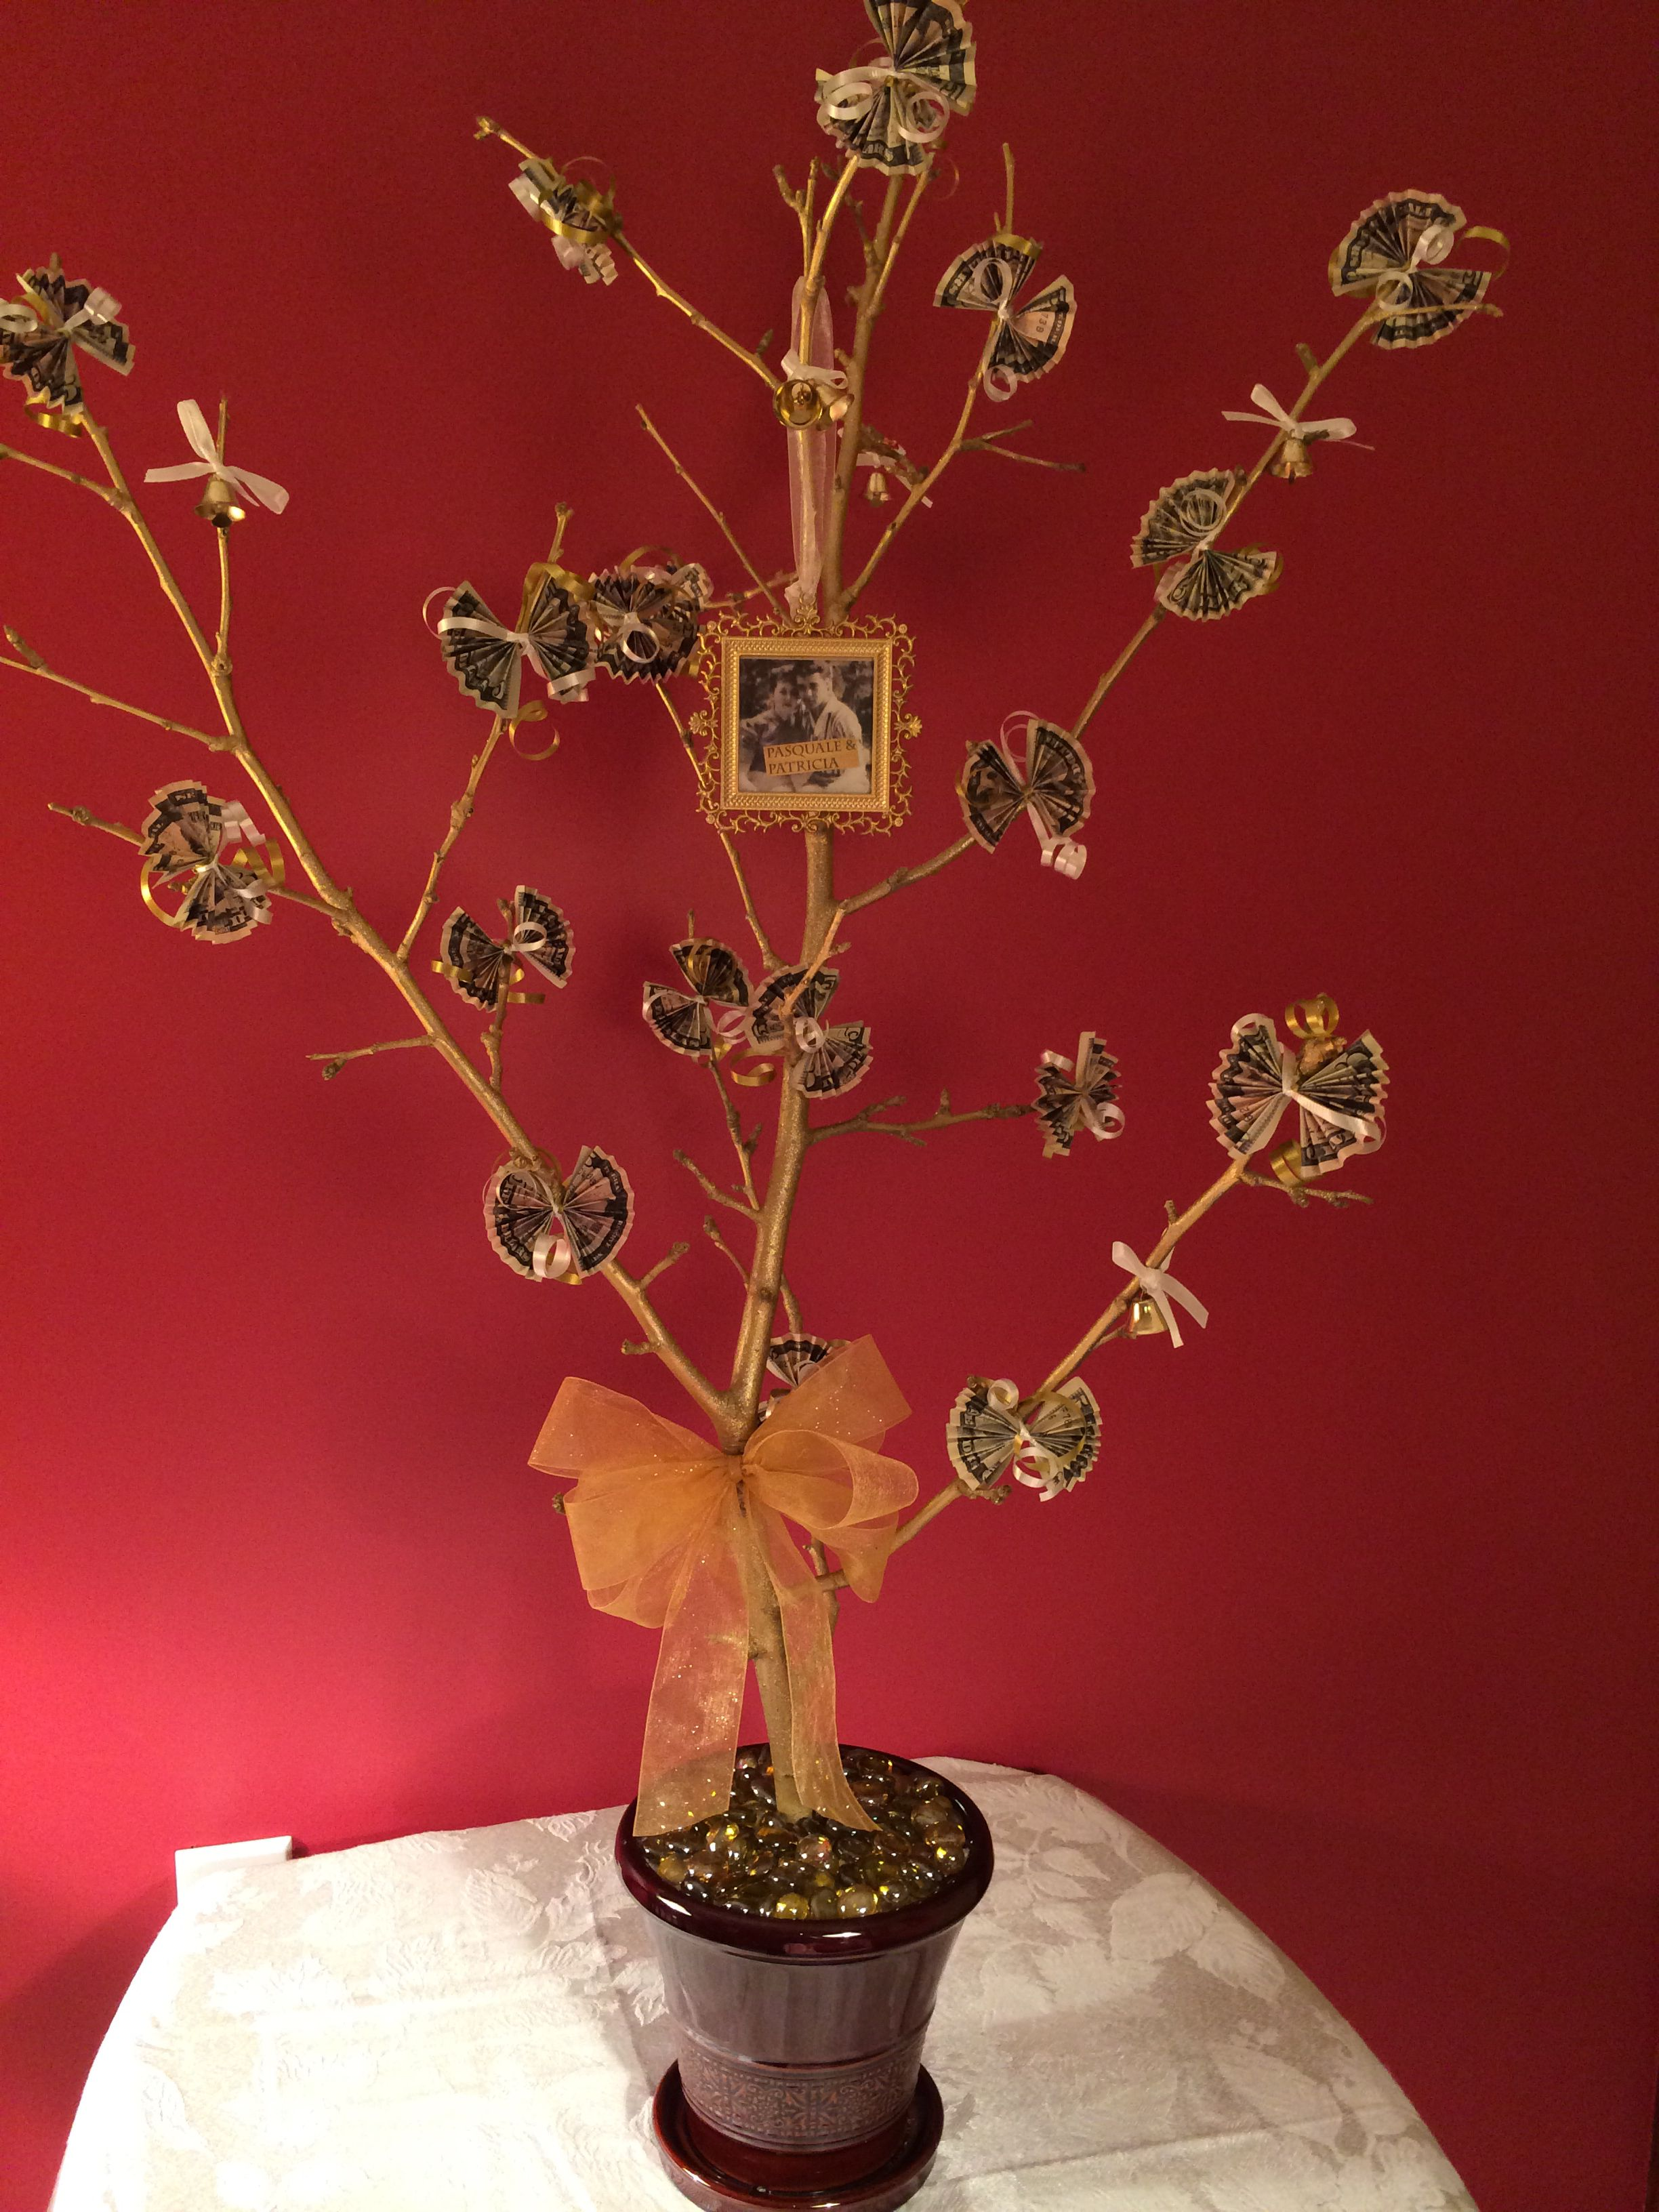 Money Tree For 50th Wedding Anniversary Gift 50 Wedding Anniversary Gifts 50th Wedding Anniversary 50th Wedding